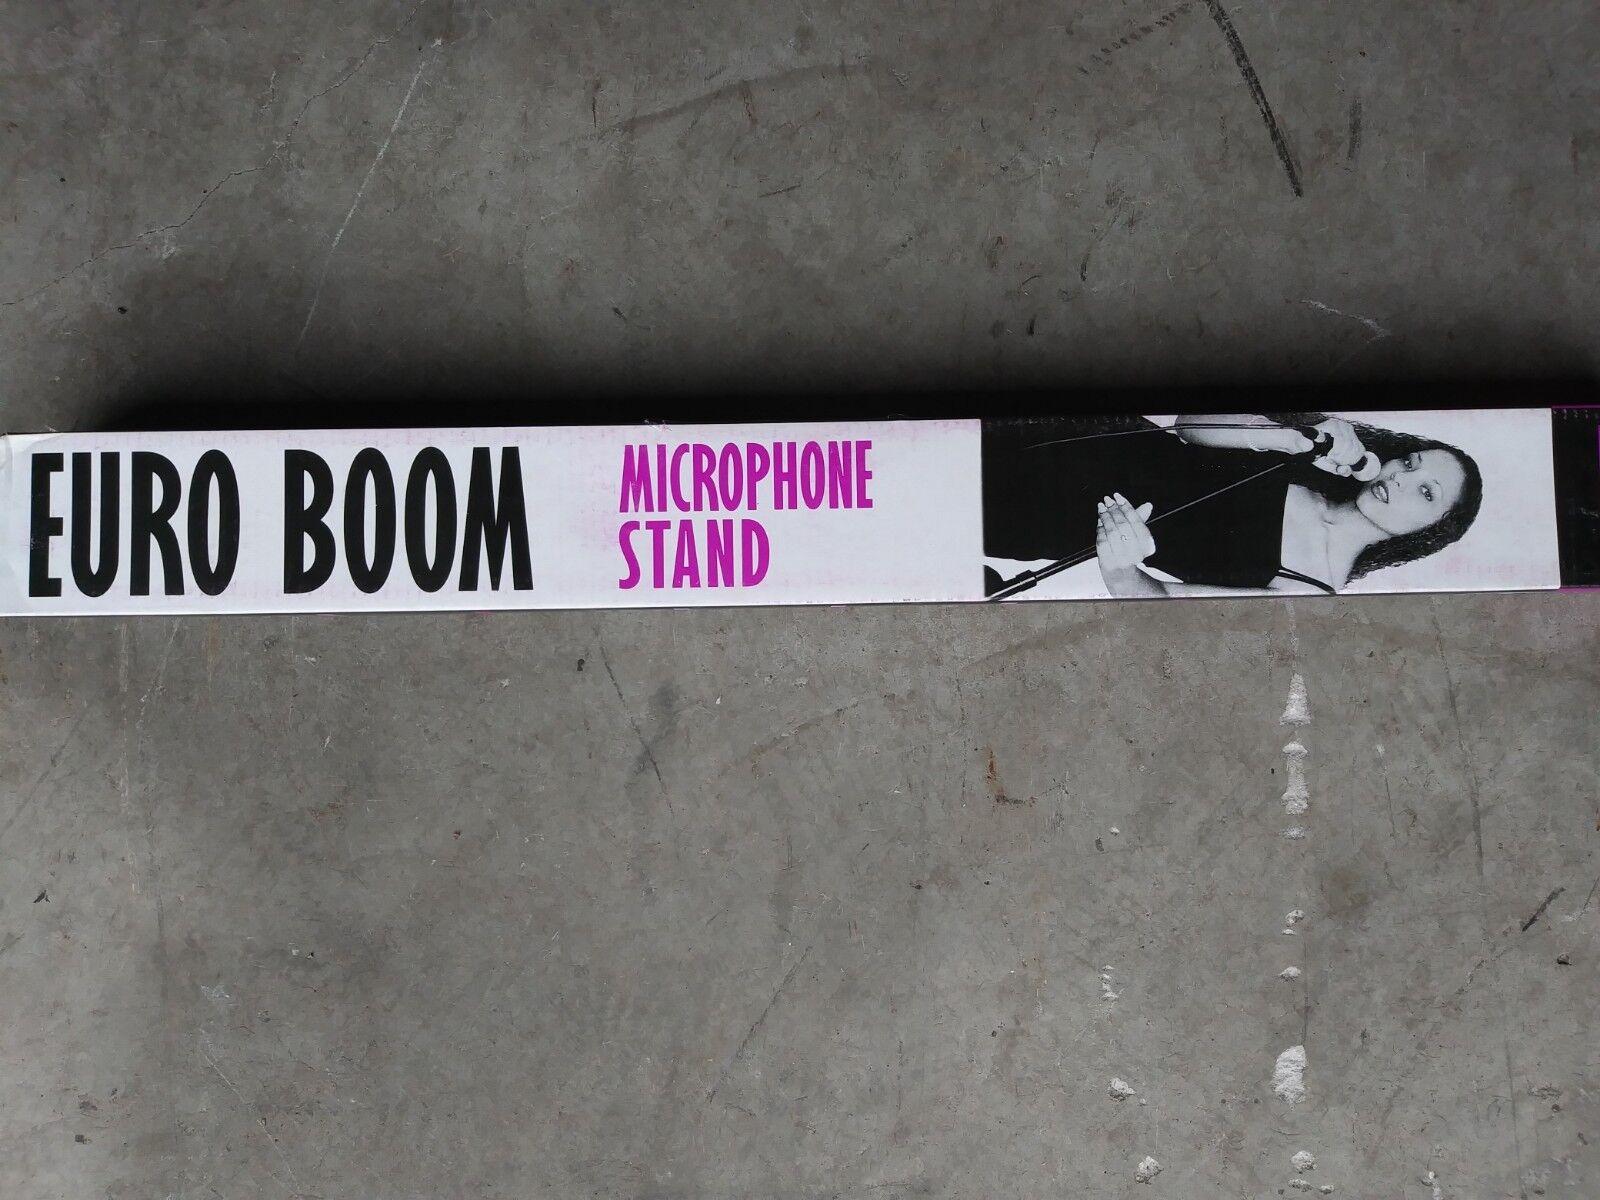 5x Microphone Boom Stand SINGLE Mic Clip Folding Arm Tripod Height Adjust